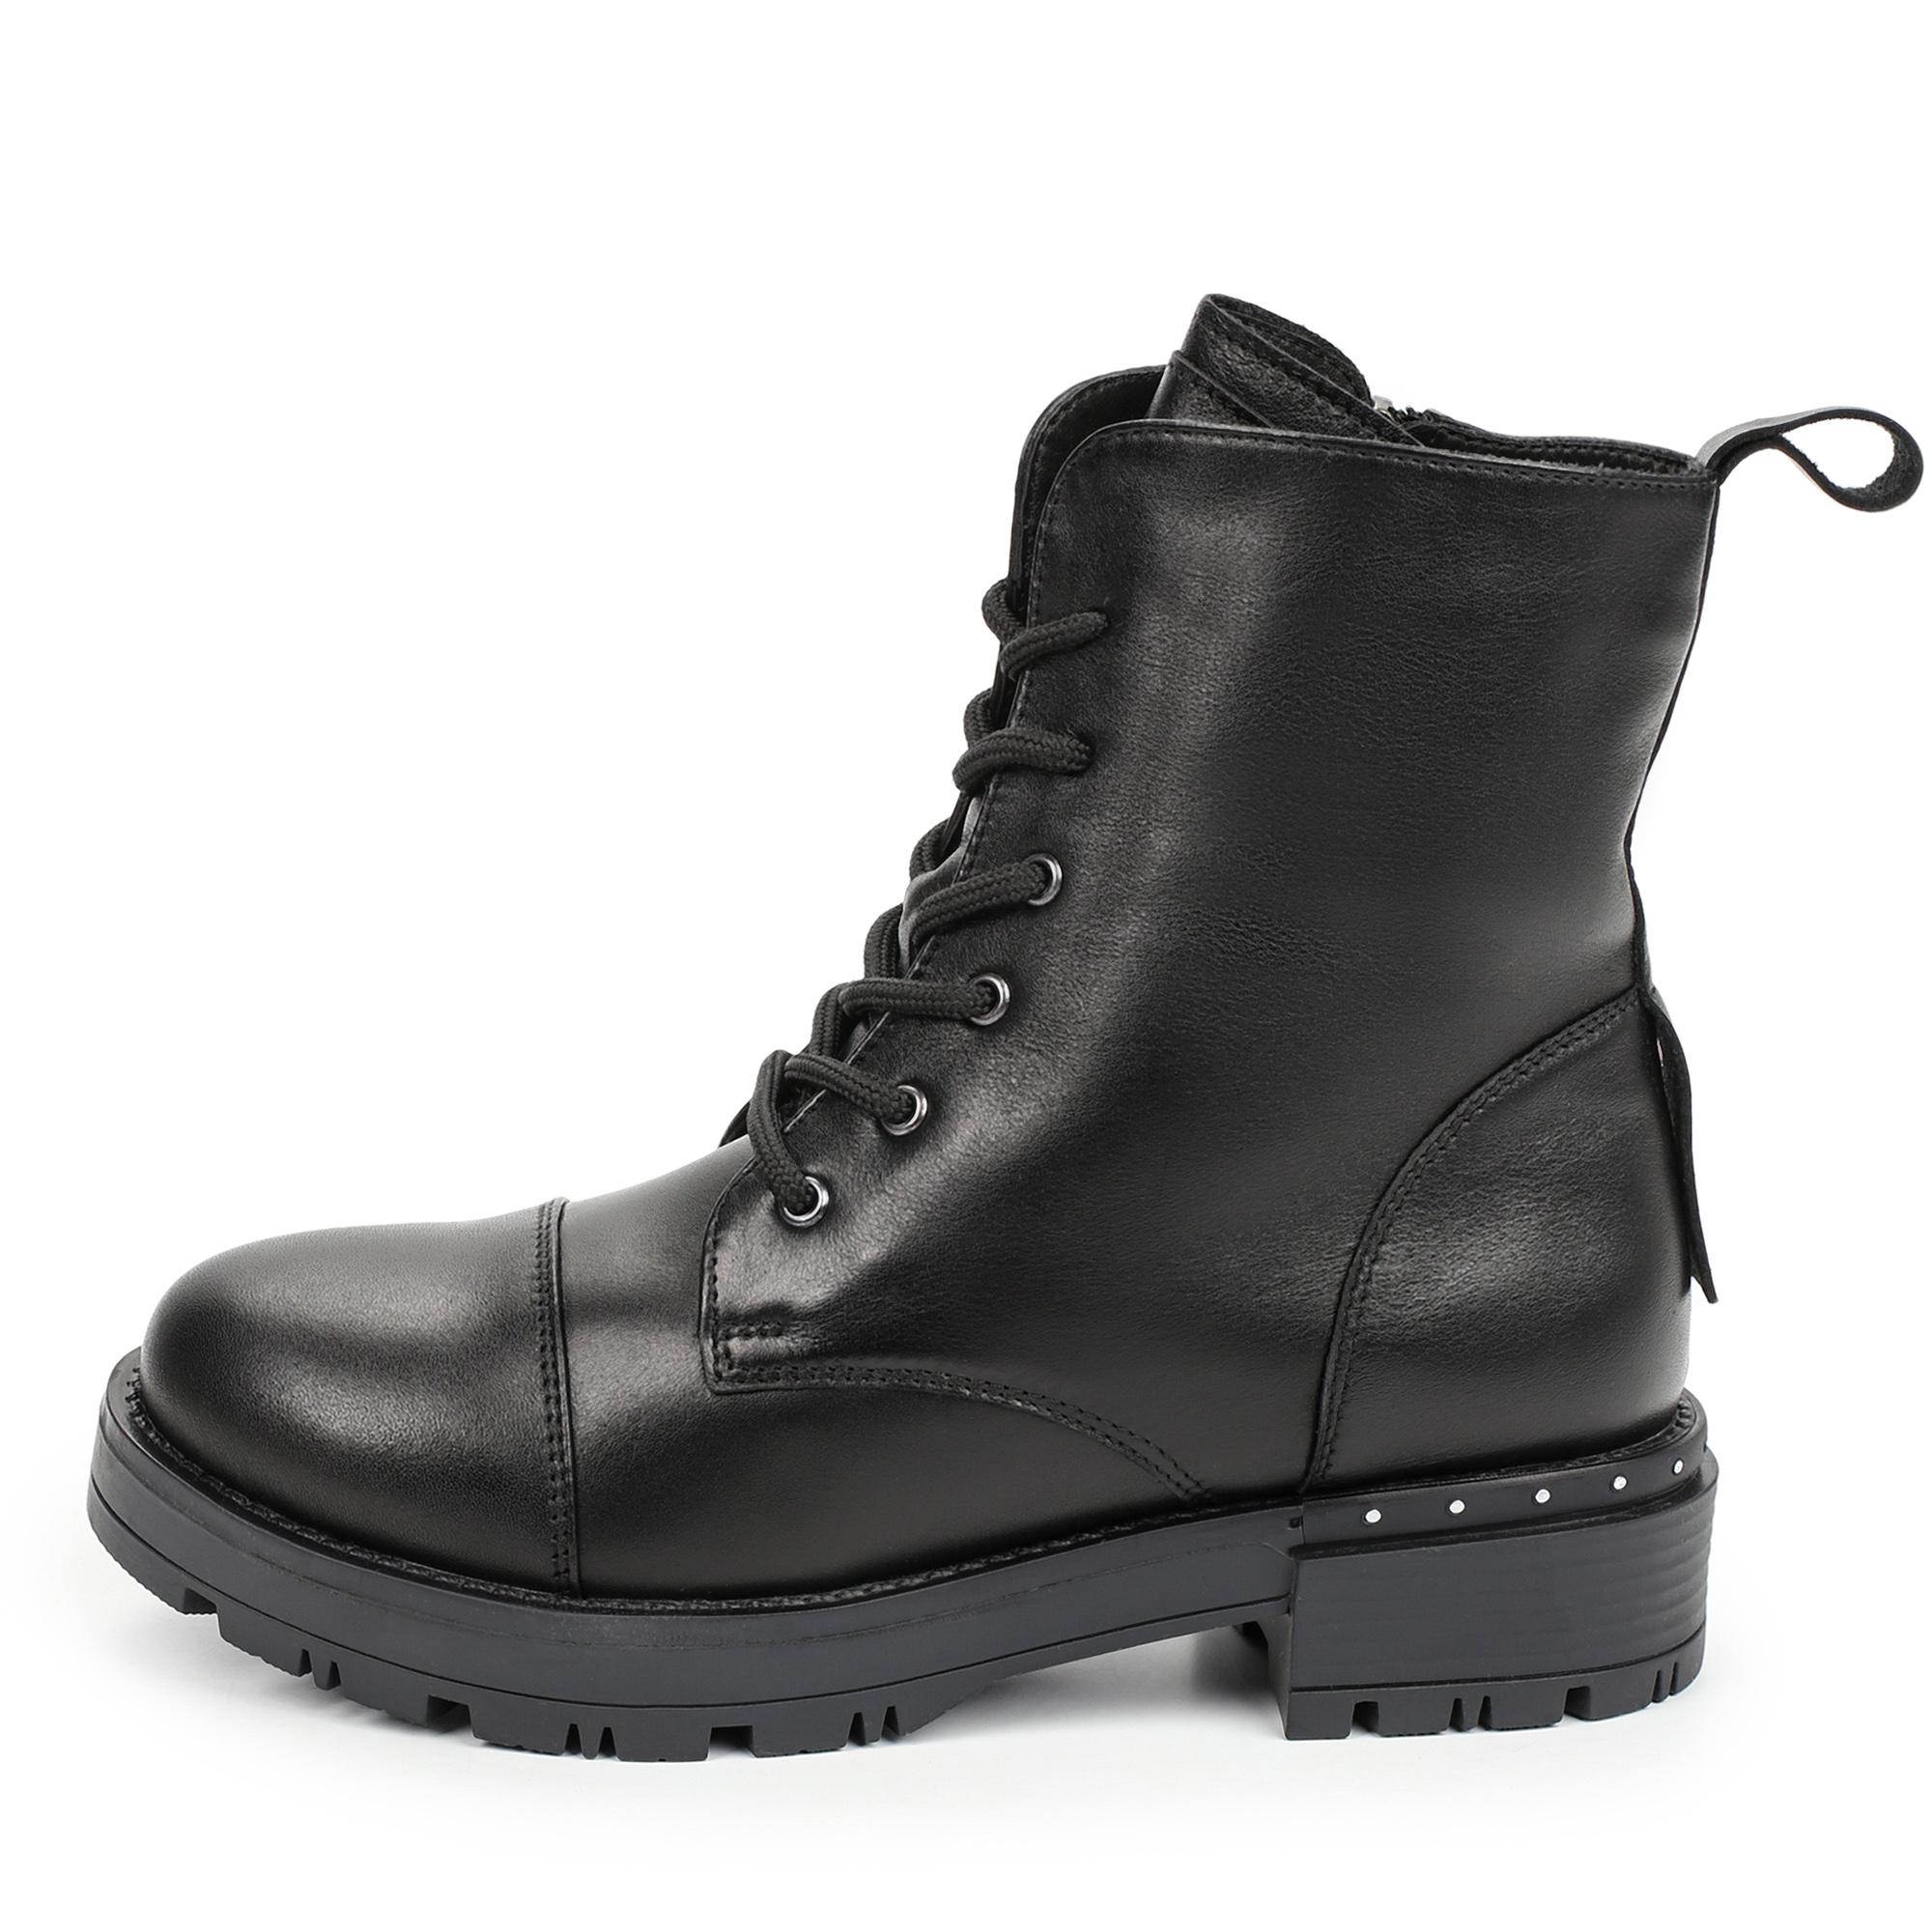 Ботинки Thomas Munz 301 001A 3102